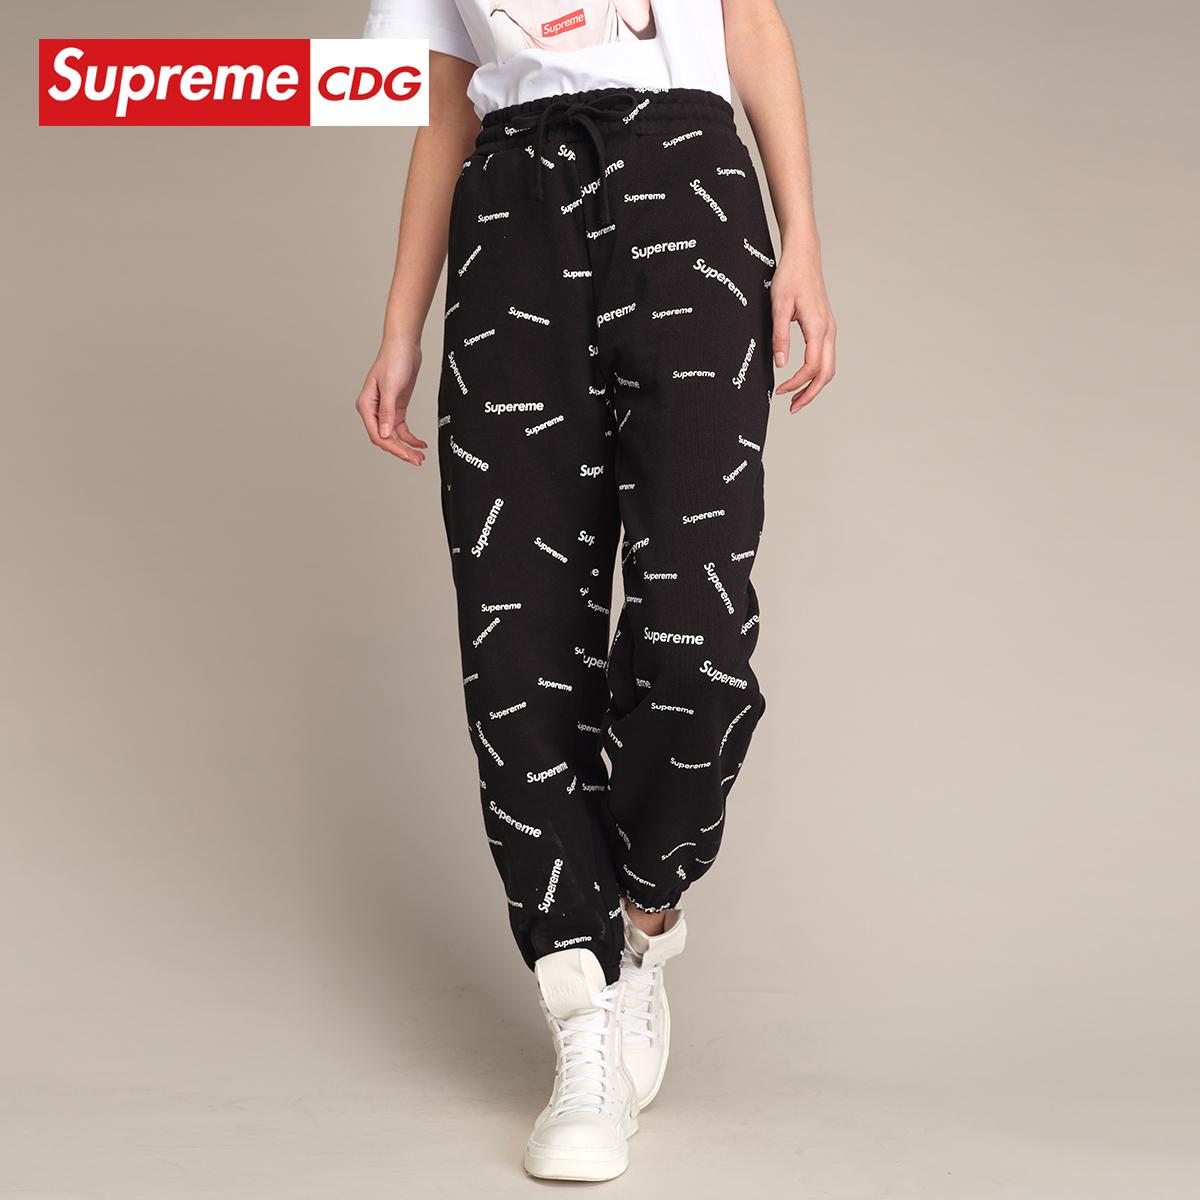 Supreme CDG 2020年春季新款街頭百搭白黑色簡約衛褲休閑褲運動褲